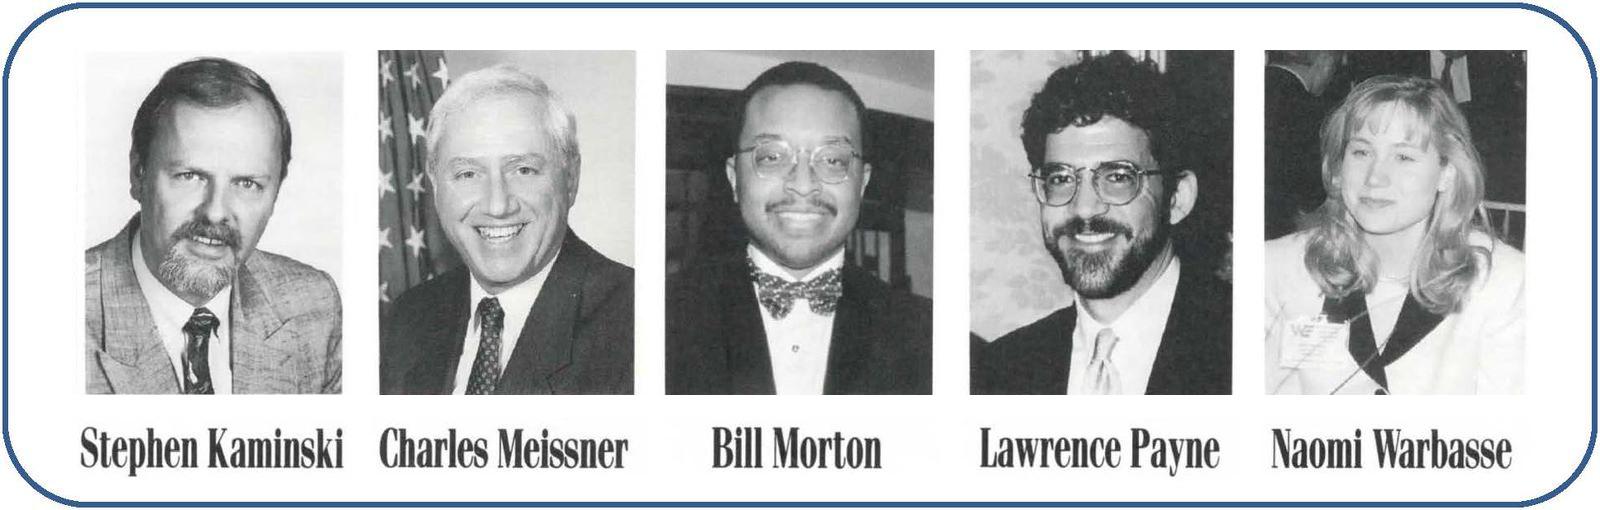 ITA Employees from left to right: Stephen Kaminski, Charles Meissner, Bill Morton, Lawrence Payne, Naomi Warbasse